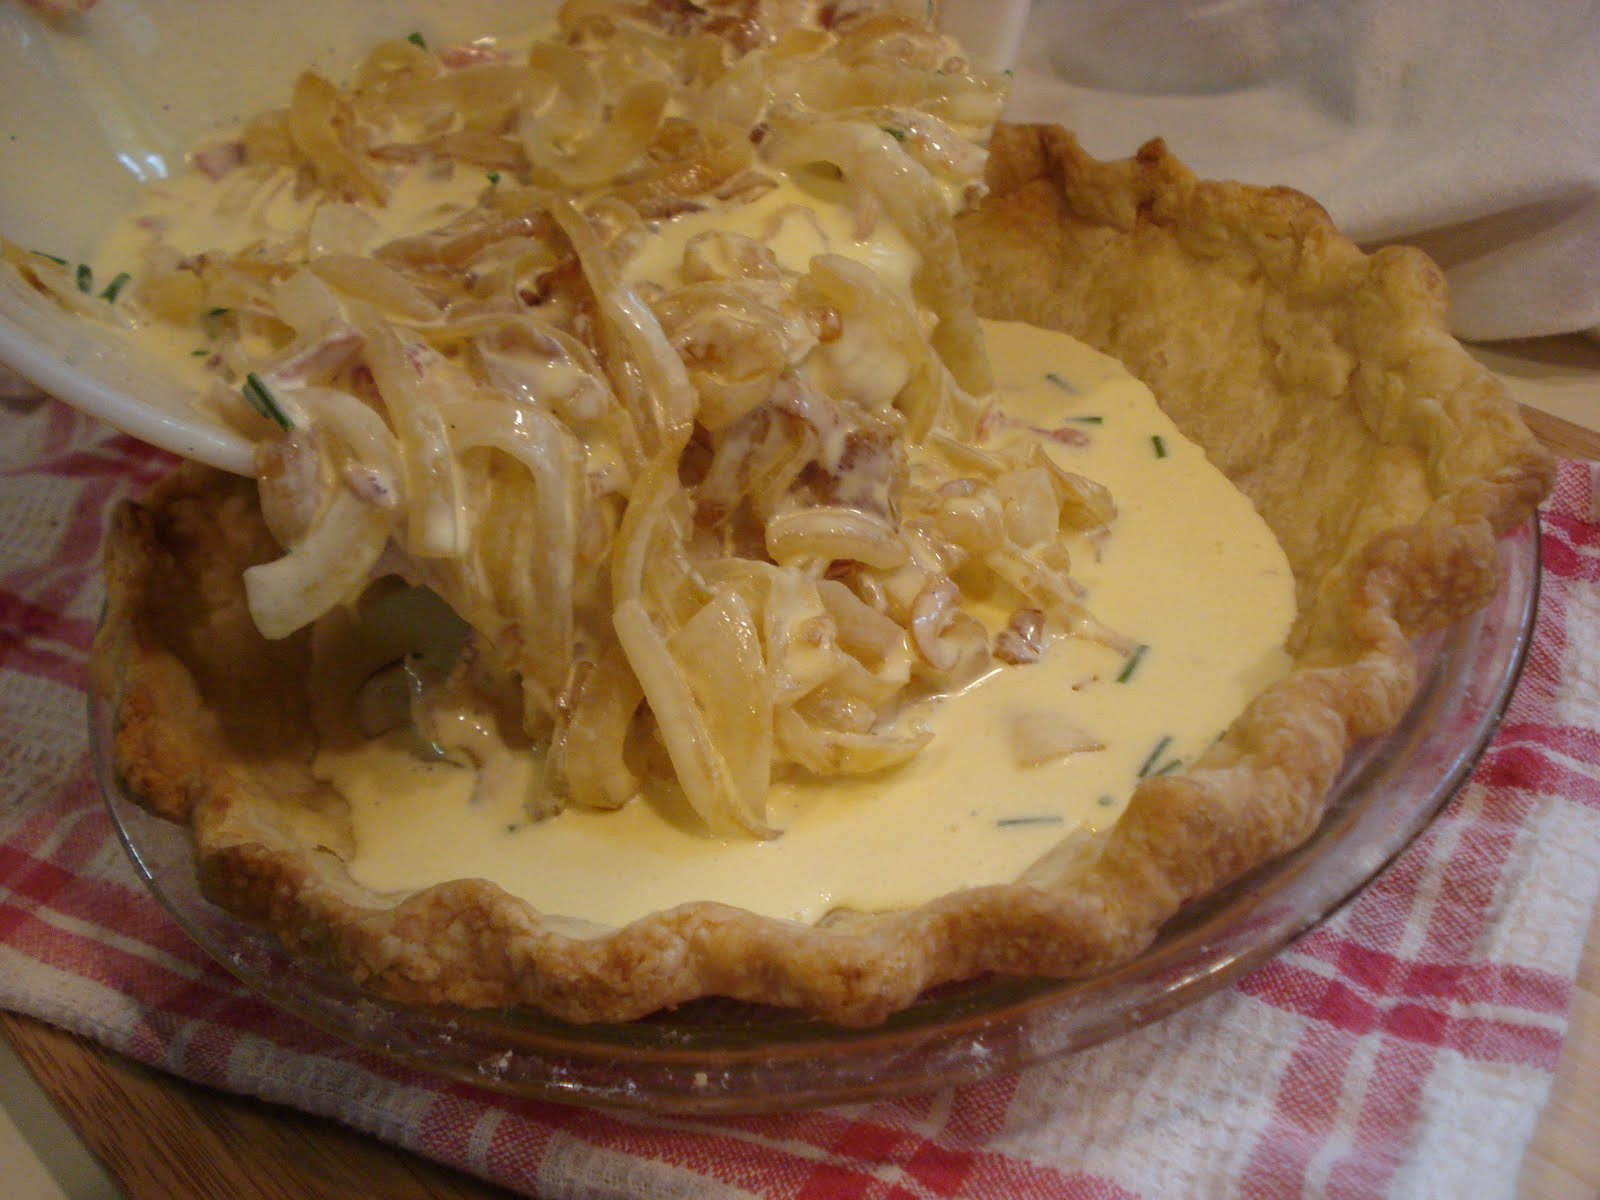 Vadalia Onion Pie  The Cookie Scoop Vidalia ion Pie